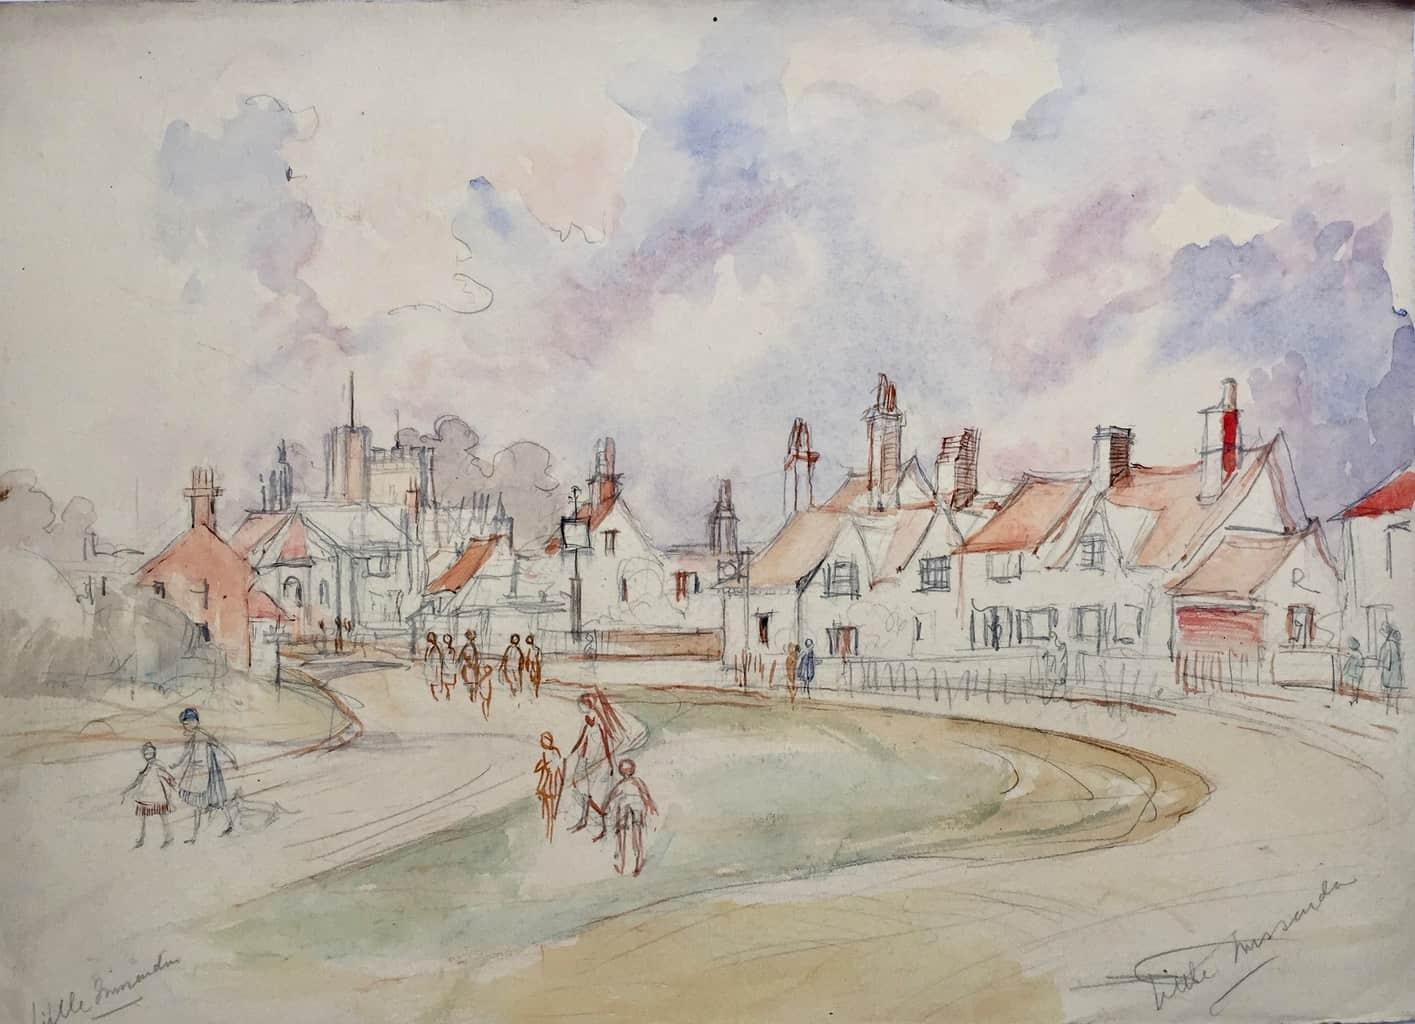 Painting of Little Missenden village